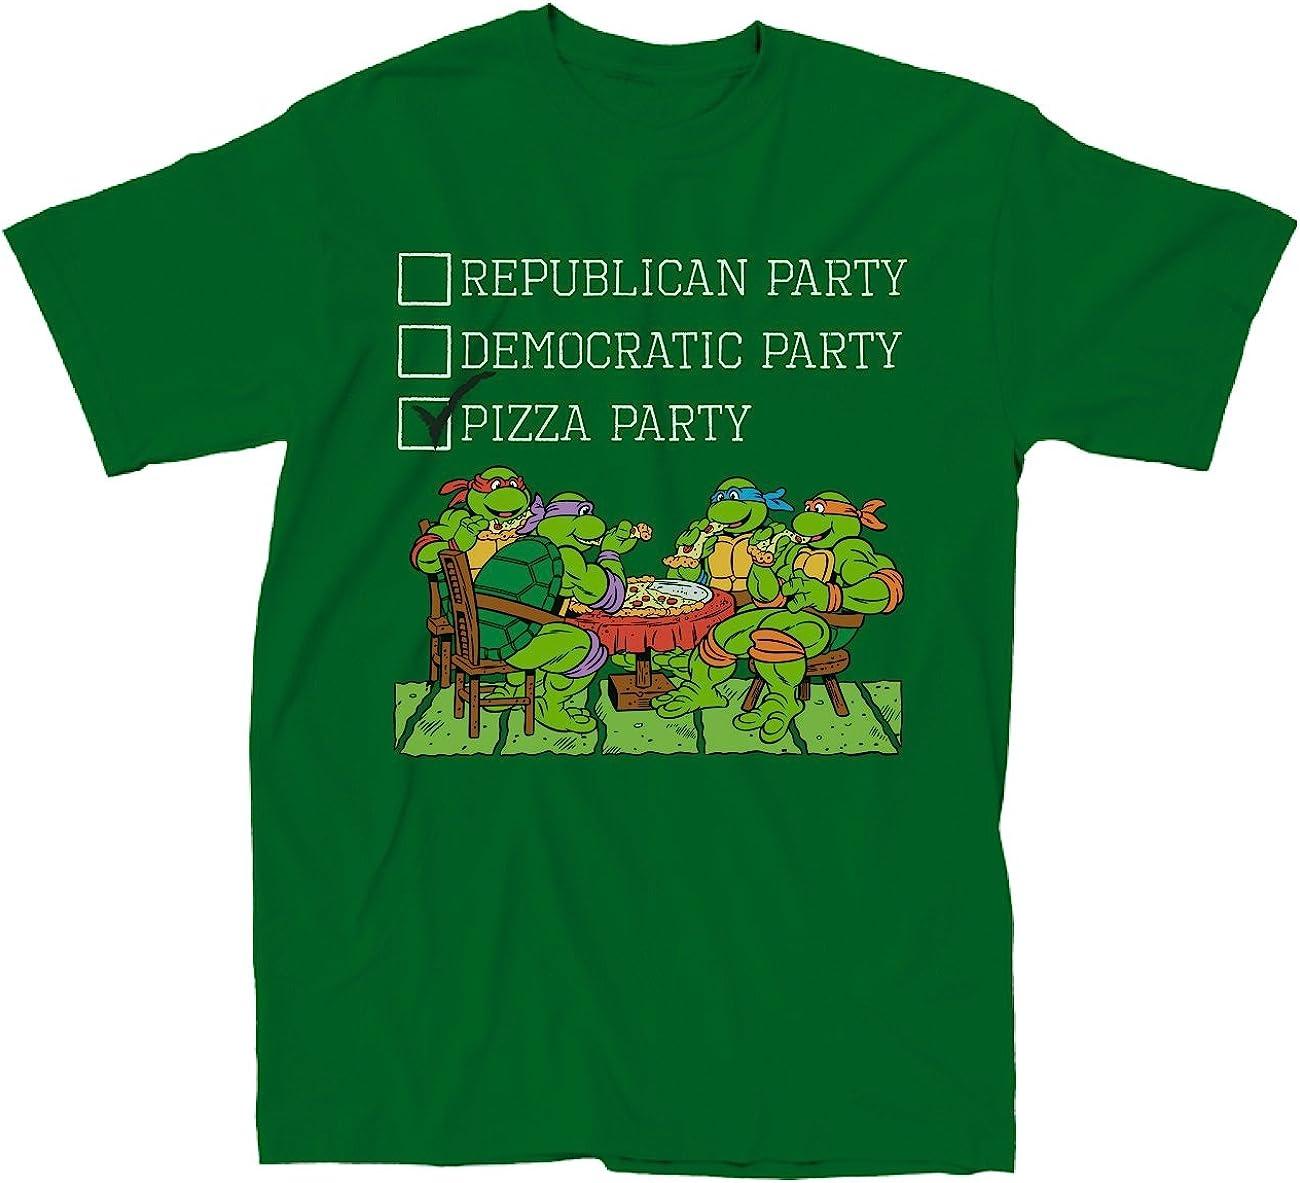 Teenage Mutant Ninja Turtles the Pizza Party Adult Green T-shirt (Adult Small)